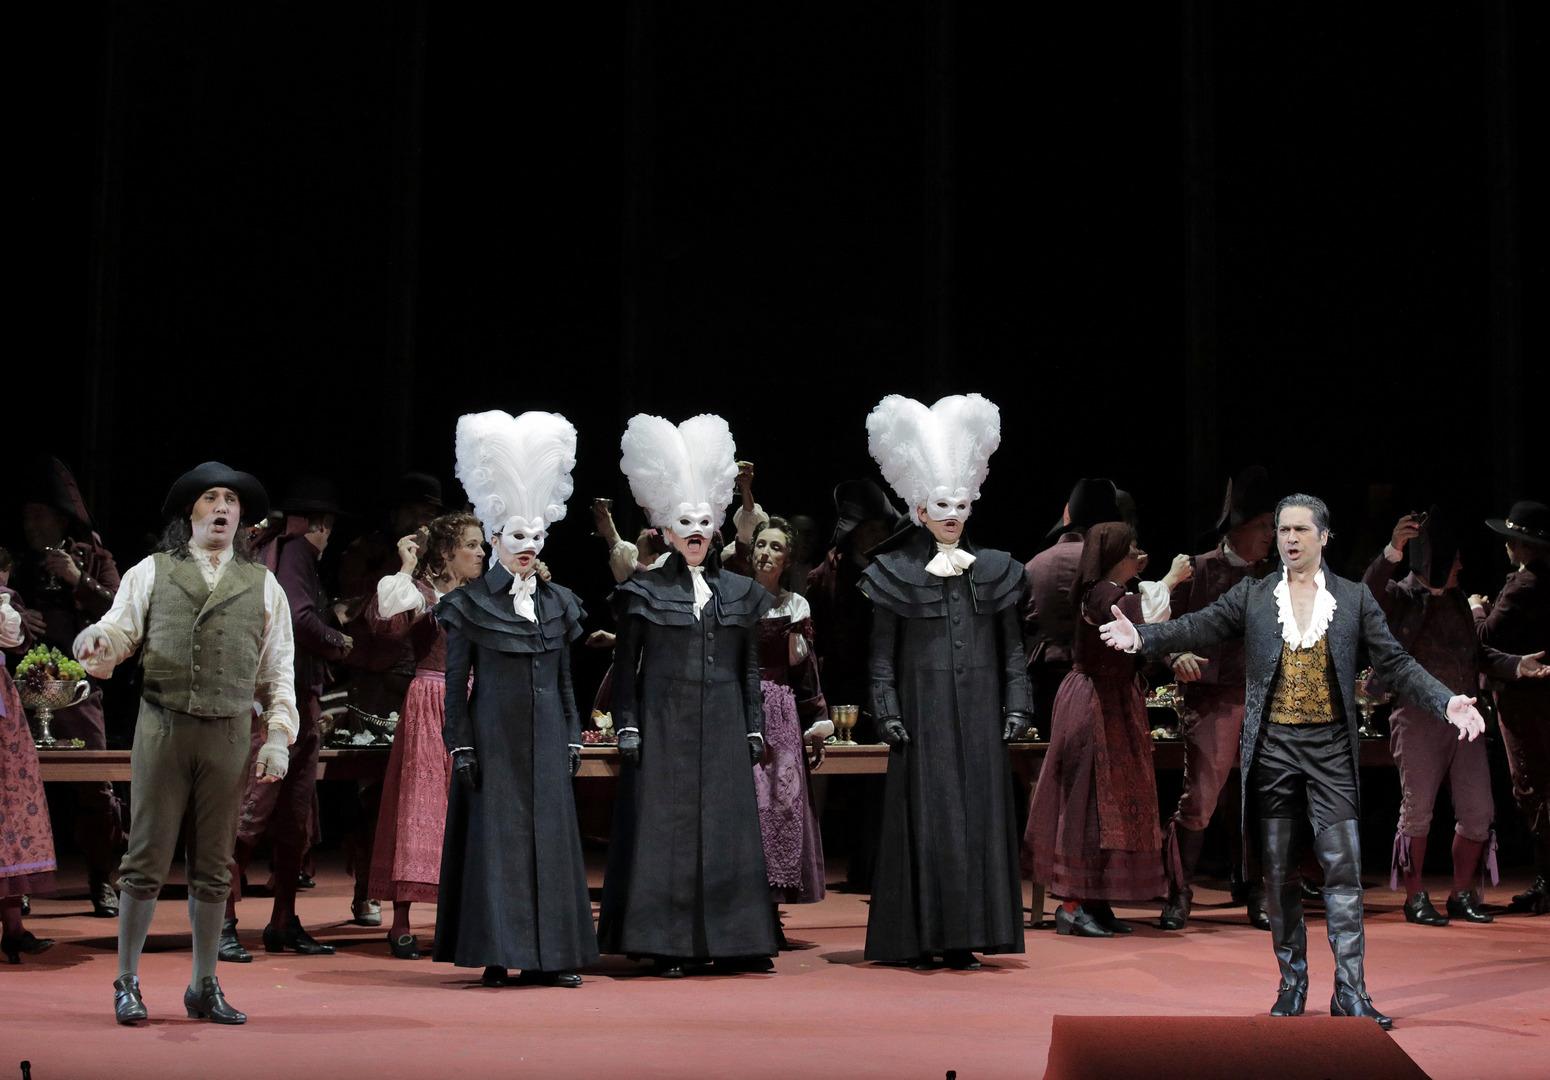 Opera-Director-Jacopo-Spirei-Don-Giovanni-Opera-by-Mozart-San-Francisco-2017-detail